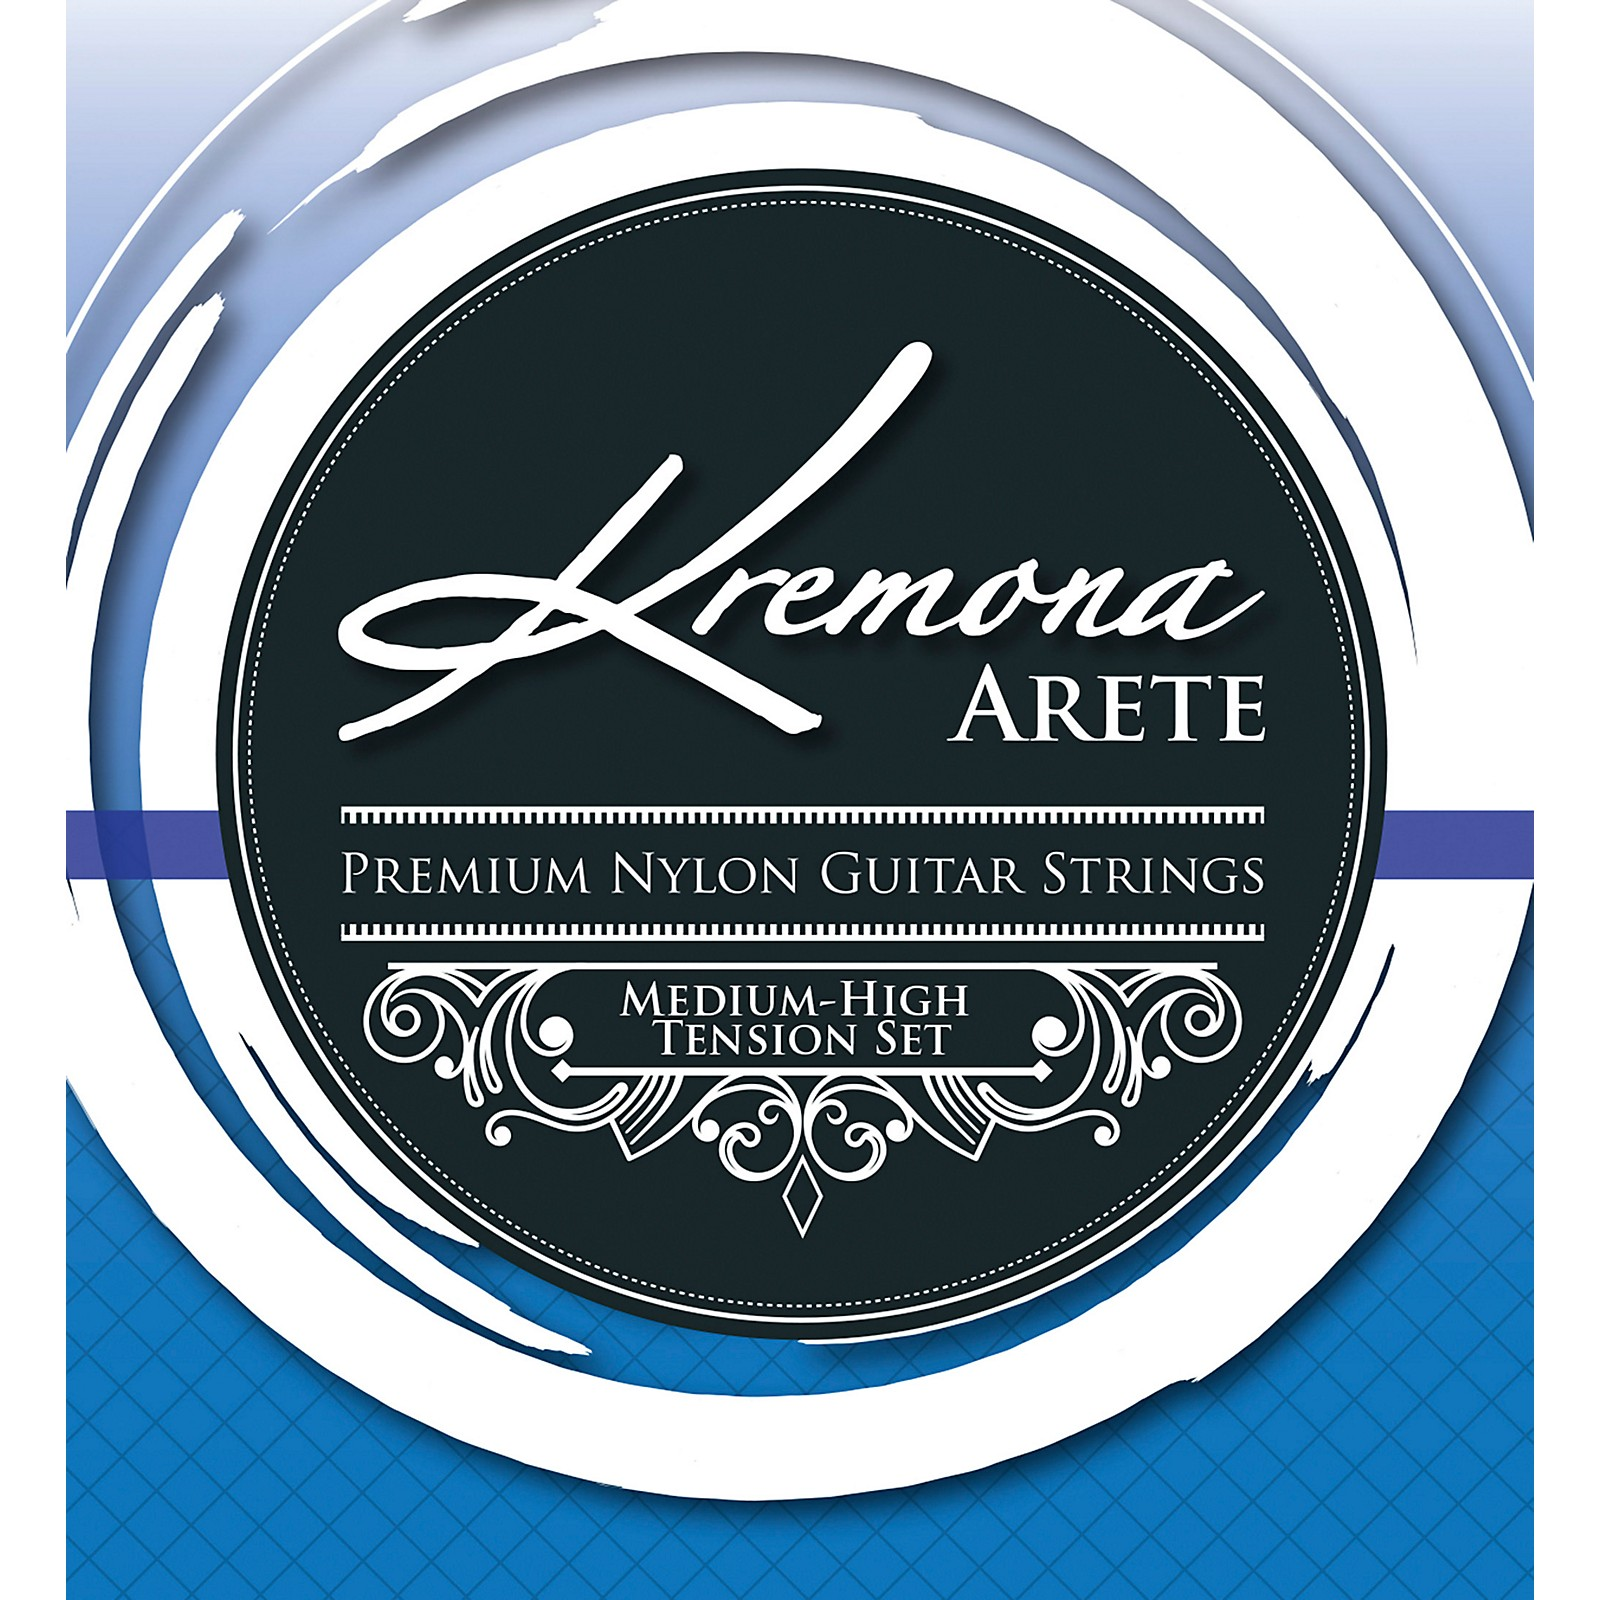 Kremona Arete Premium Nylon Guitar Strings Medium-High Tension Set